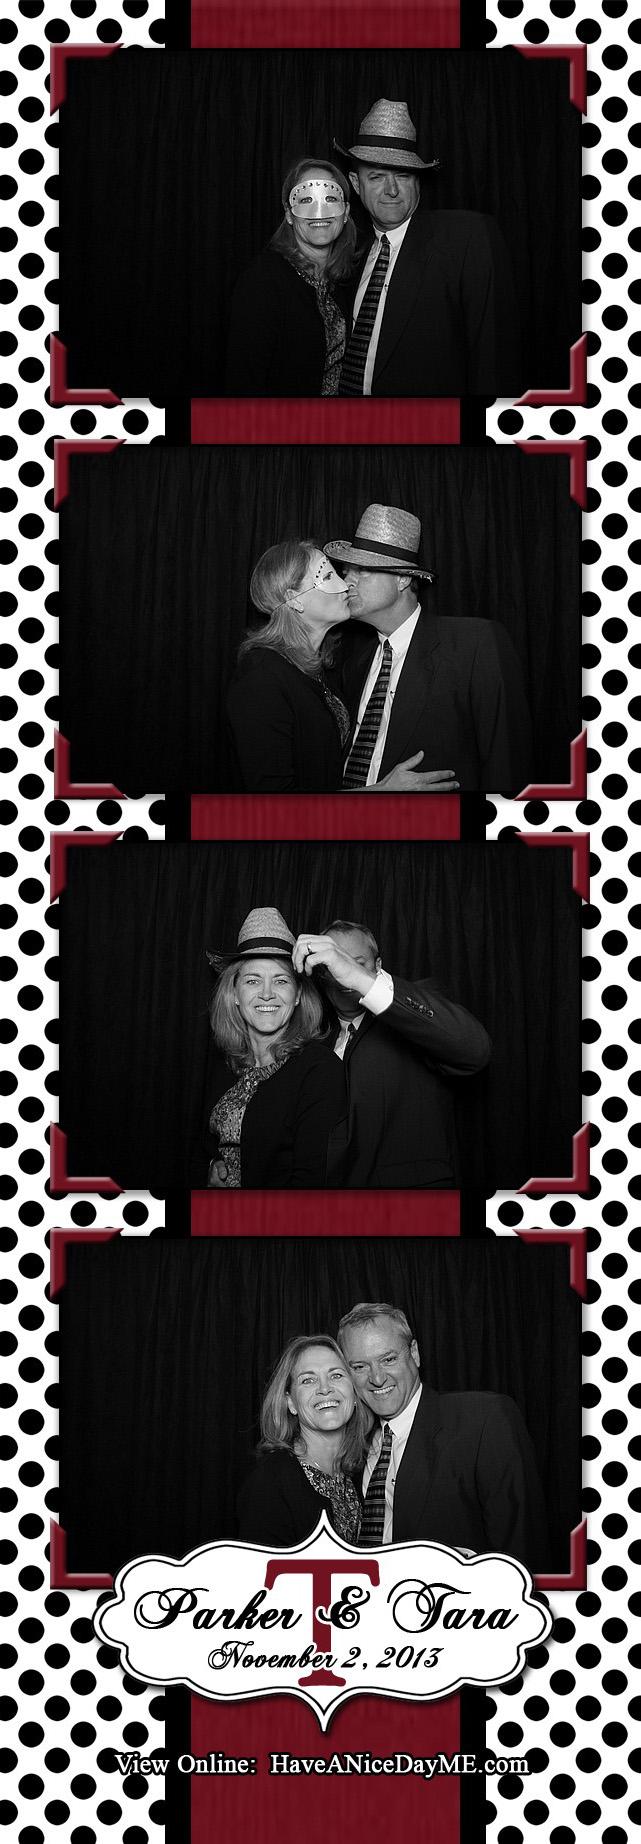 Tara and Parker Timmons - Wedding